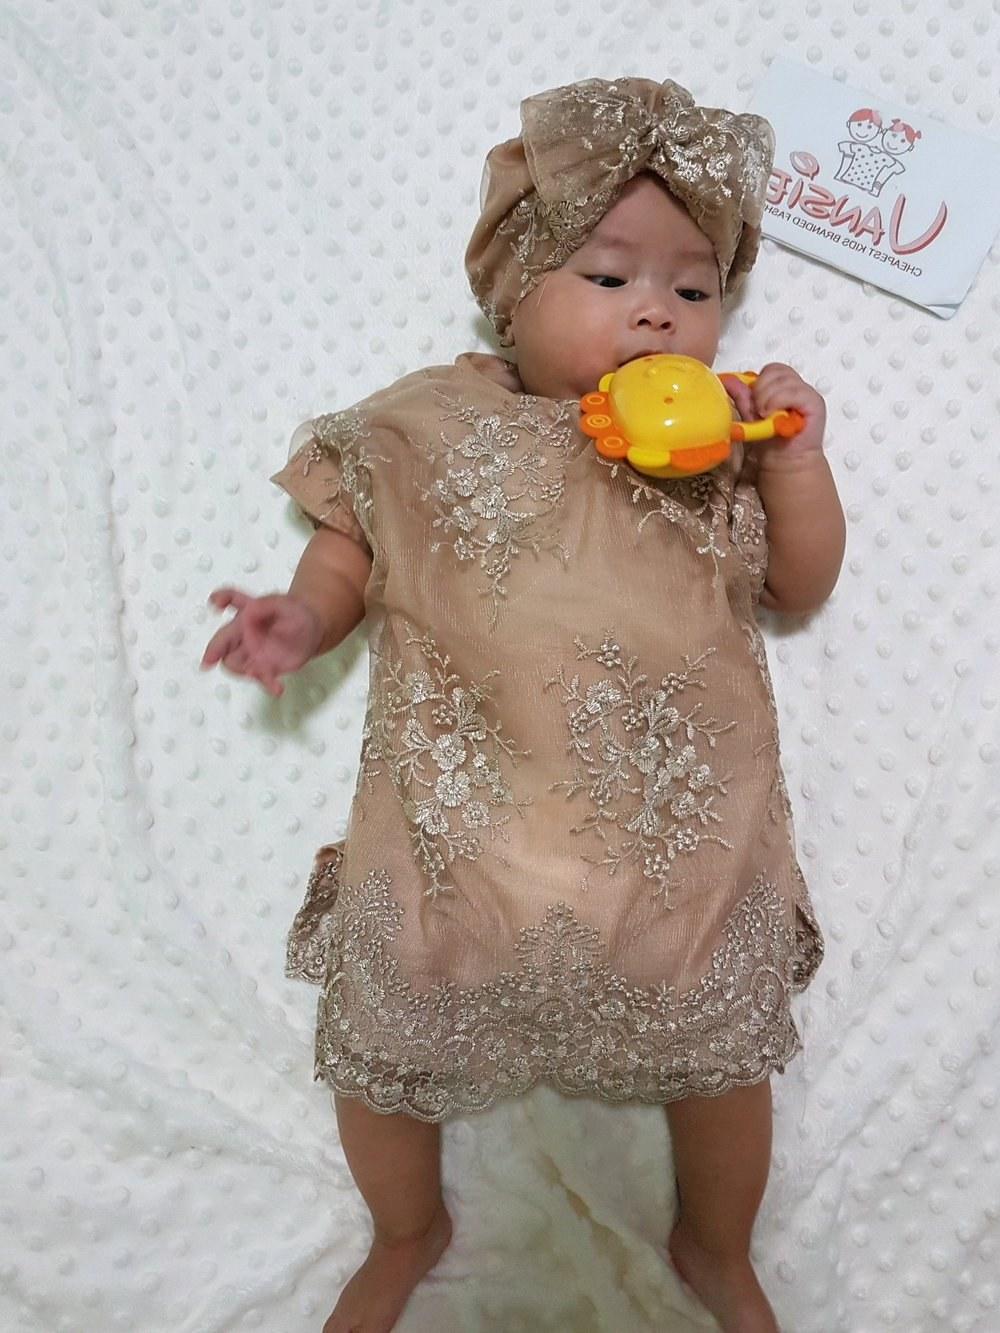 Ide Baju Lebaran Bayi Perempuan Wddj Jual Baju Muslim Lebaran Bayi Anak Kaftan Set Turban